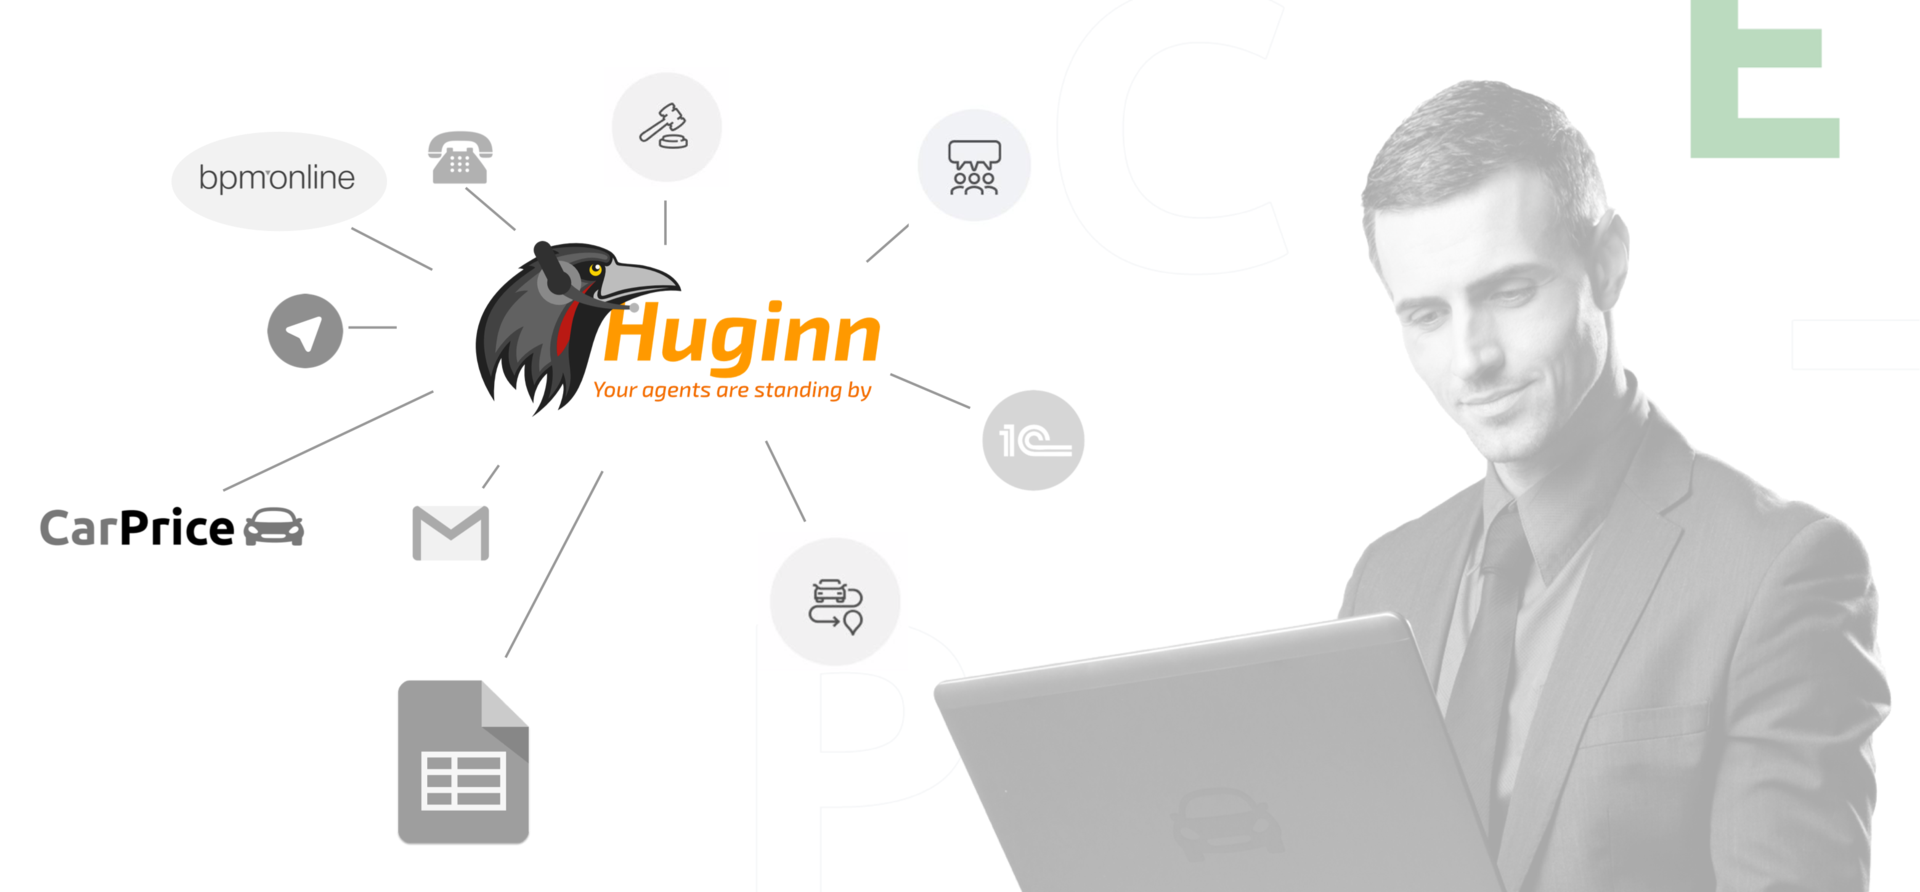 Huginn: простая интеграционная платформа - 1